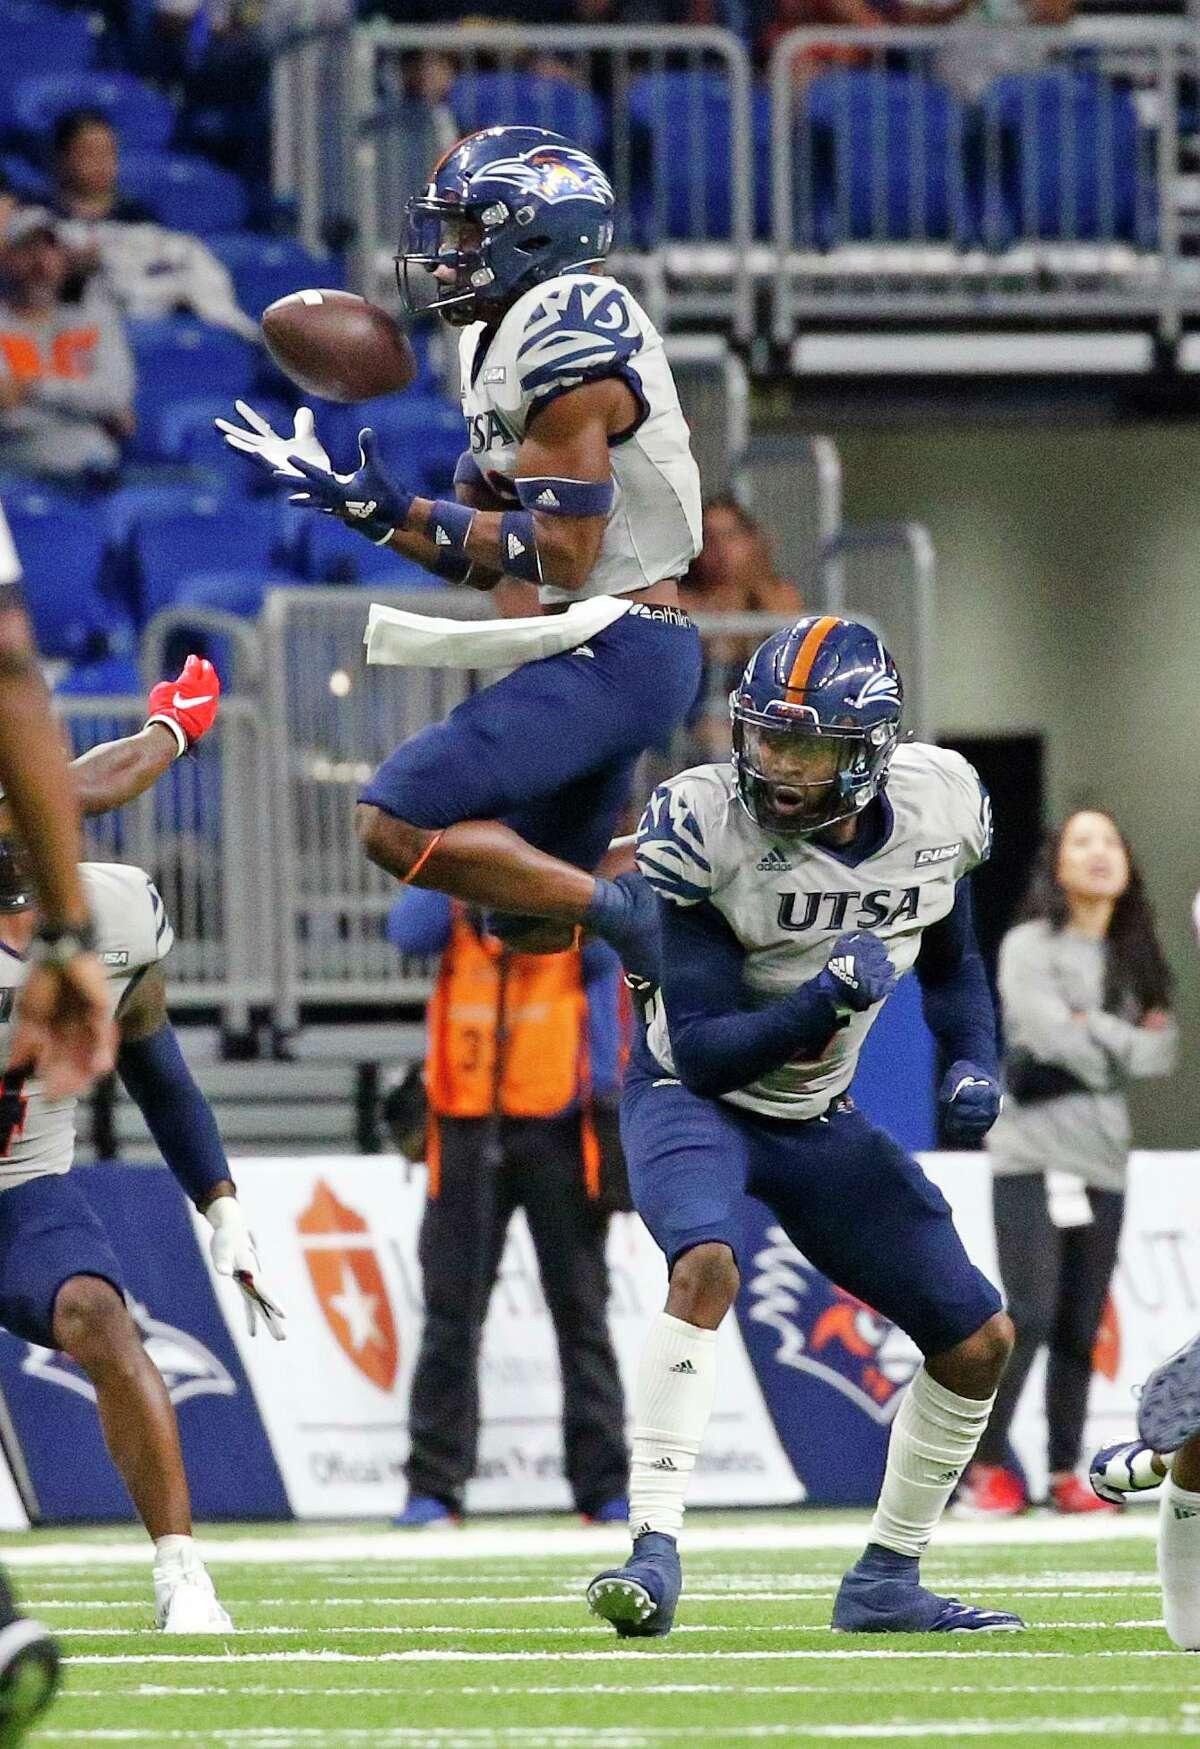 UTSA defensive back Jamal Sam (13) makes an interception in second half. UTSA defeats UNLV 24-17 on Saturday, Oct. 2, 2021.